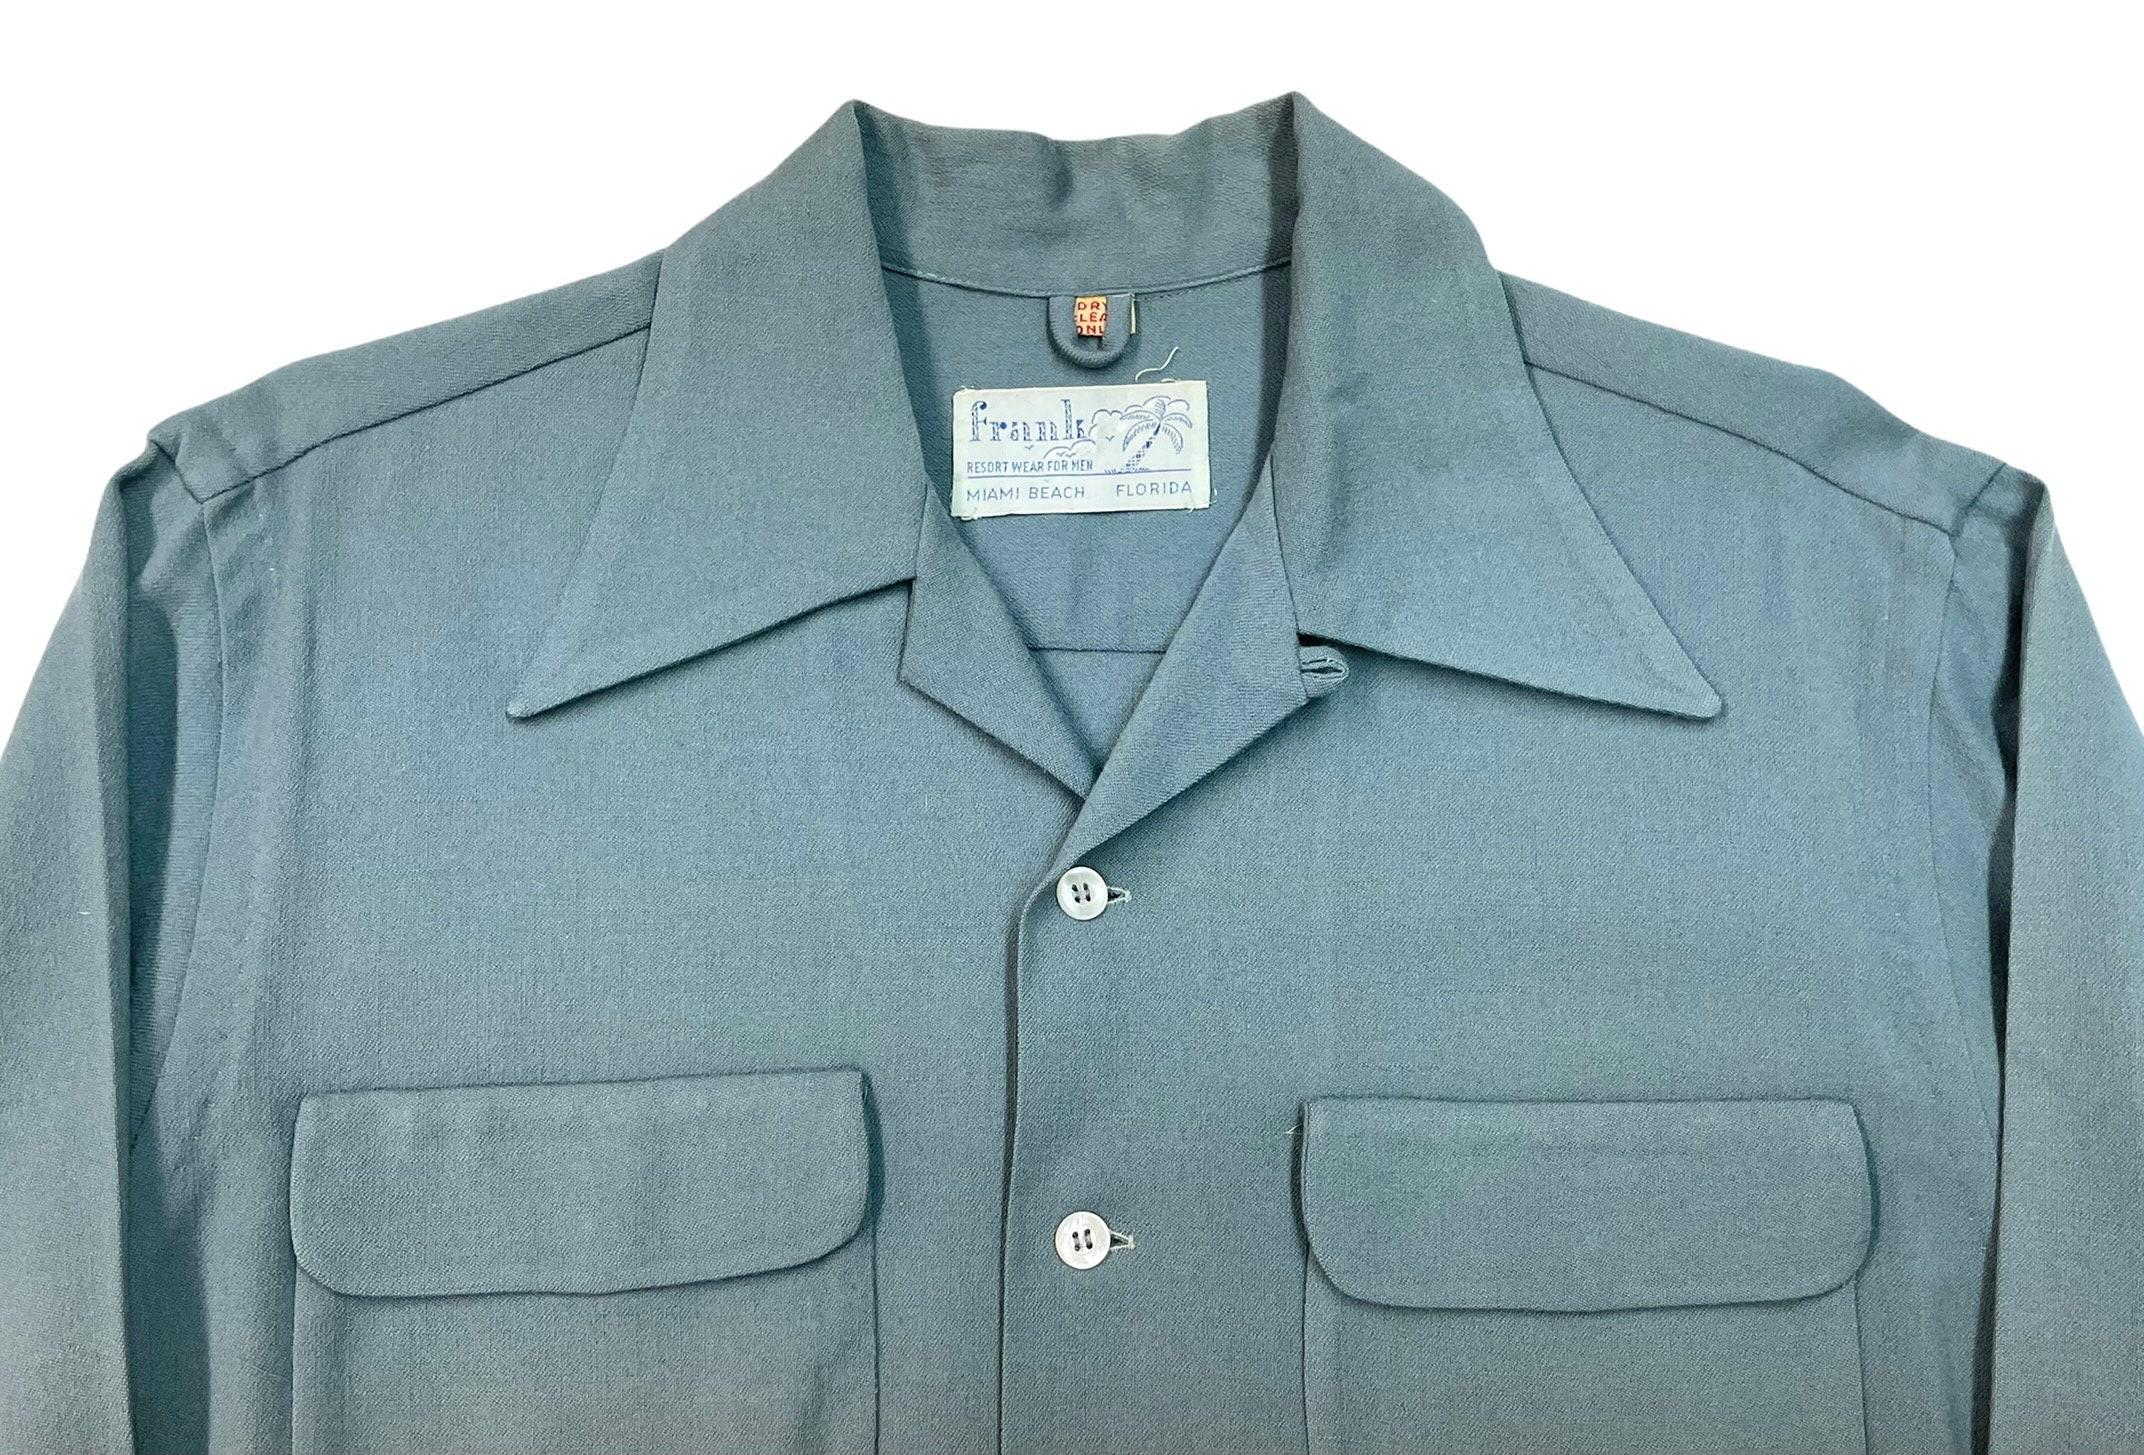 1950s Mens Hats | 50s Vintage Men's Hats Vintage 1950S Rayon  Wool Loop Collar Shirt Sz M $124.99 AT vintagedancer.com